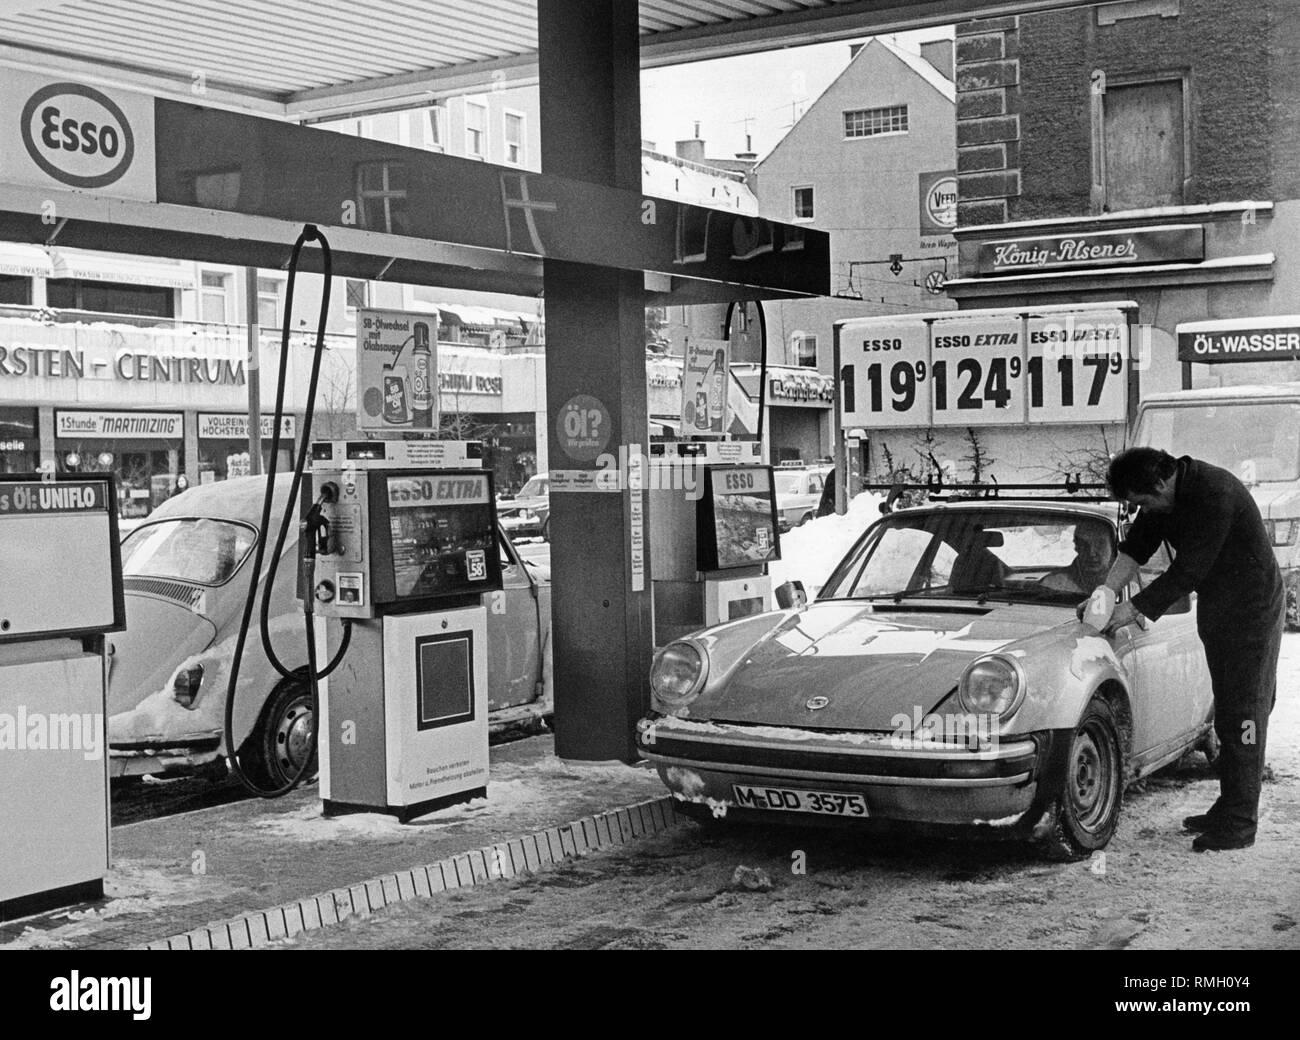 A VW Beetle and a Porsche 911 G model at an Esso petrol station on Kurfuerstenplatz in Munich Stock Photo